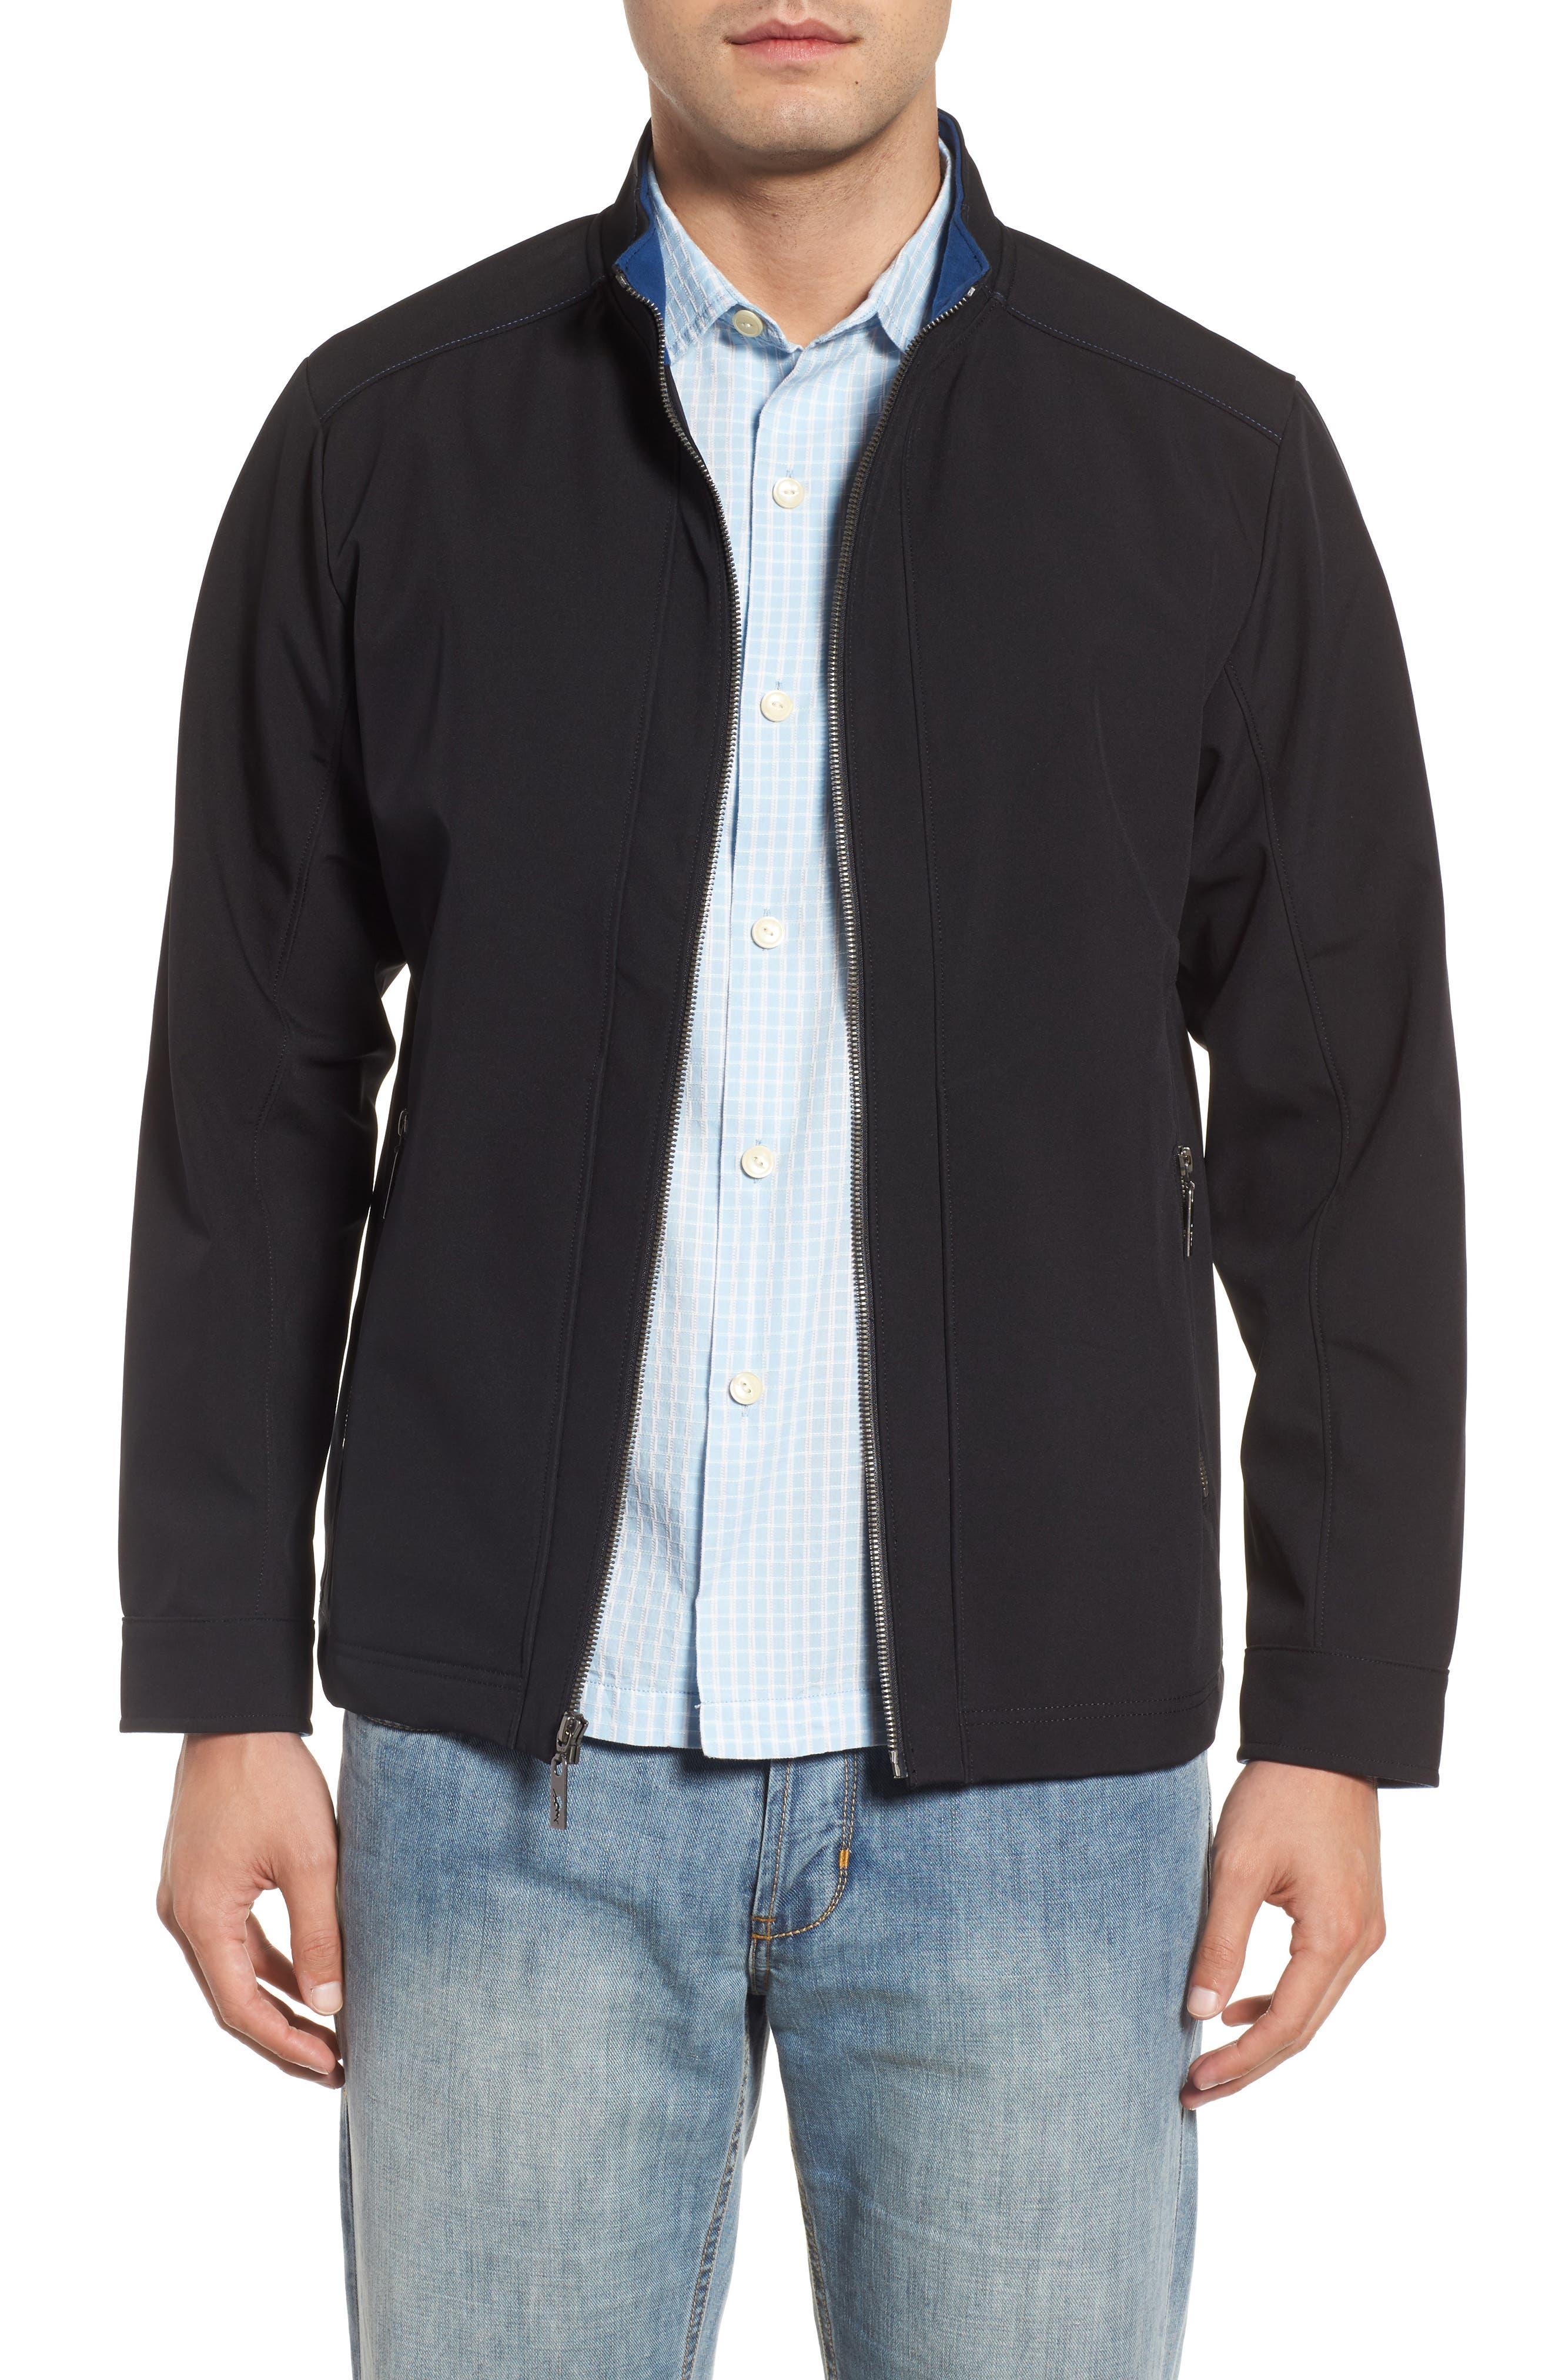 Downswing Zip Jacket,                         Main,                         color, 001